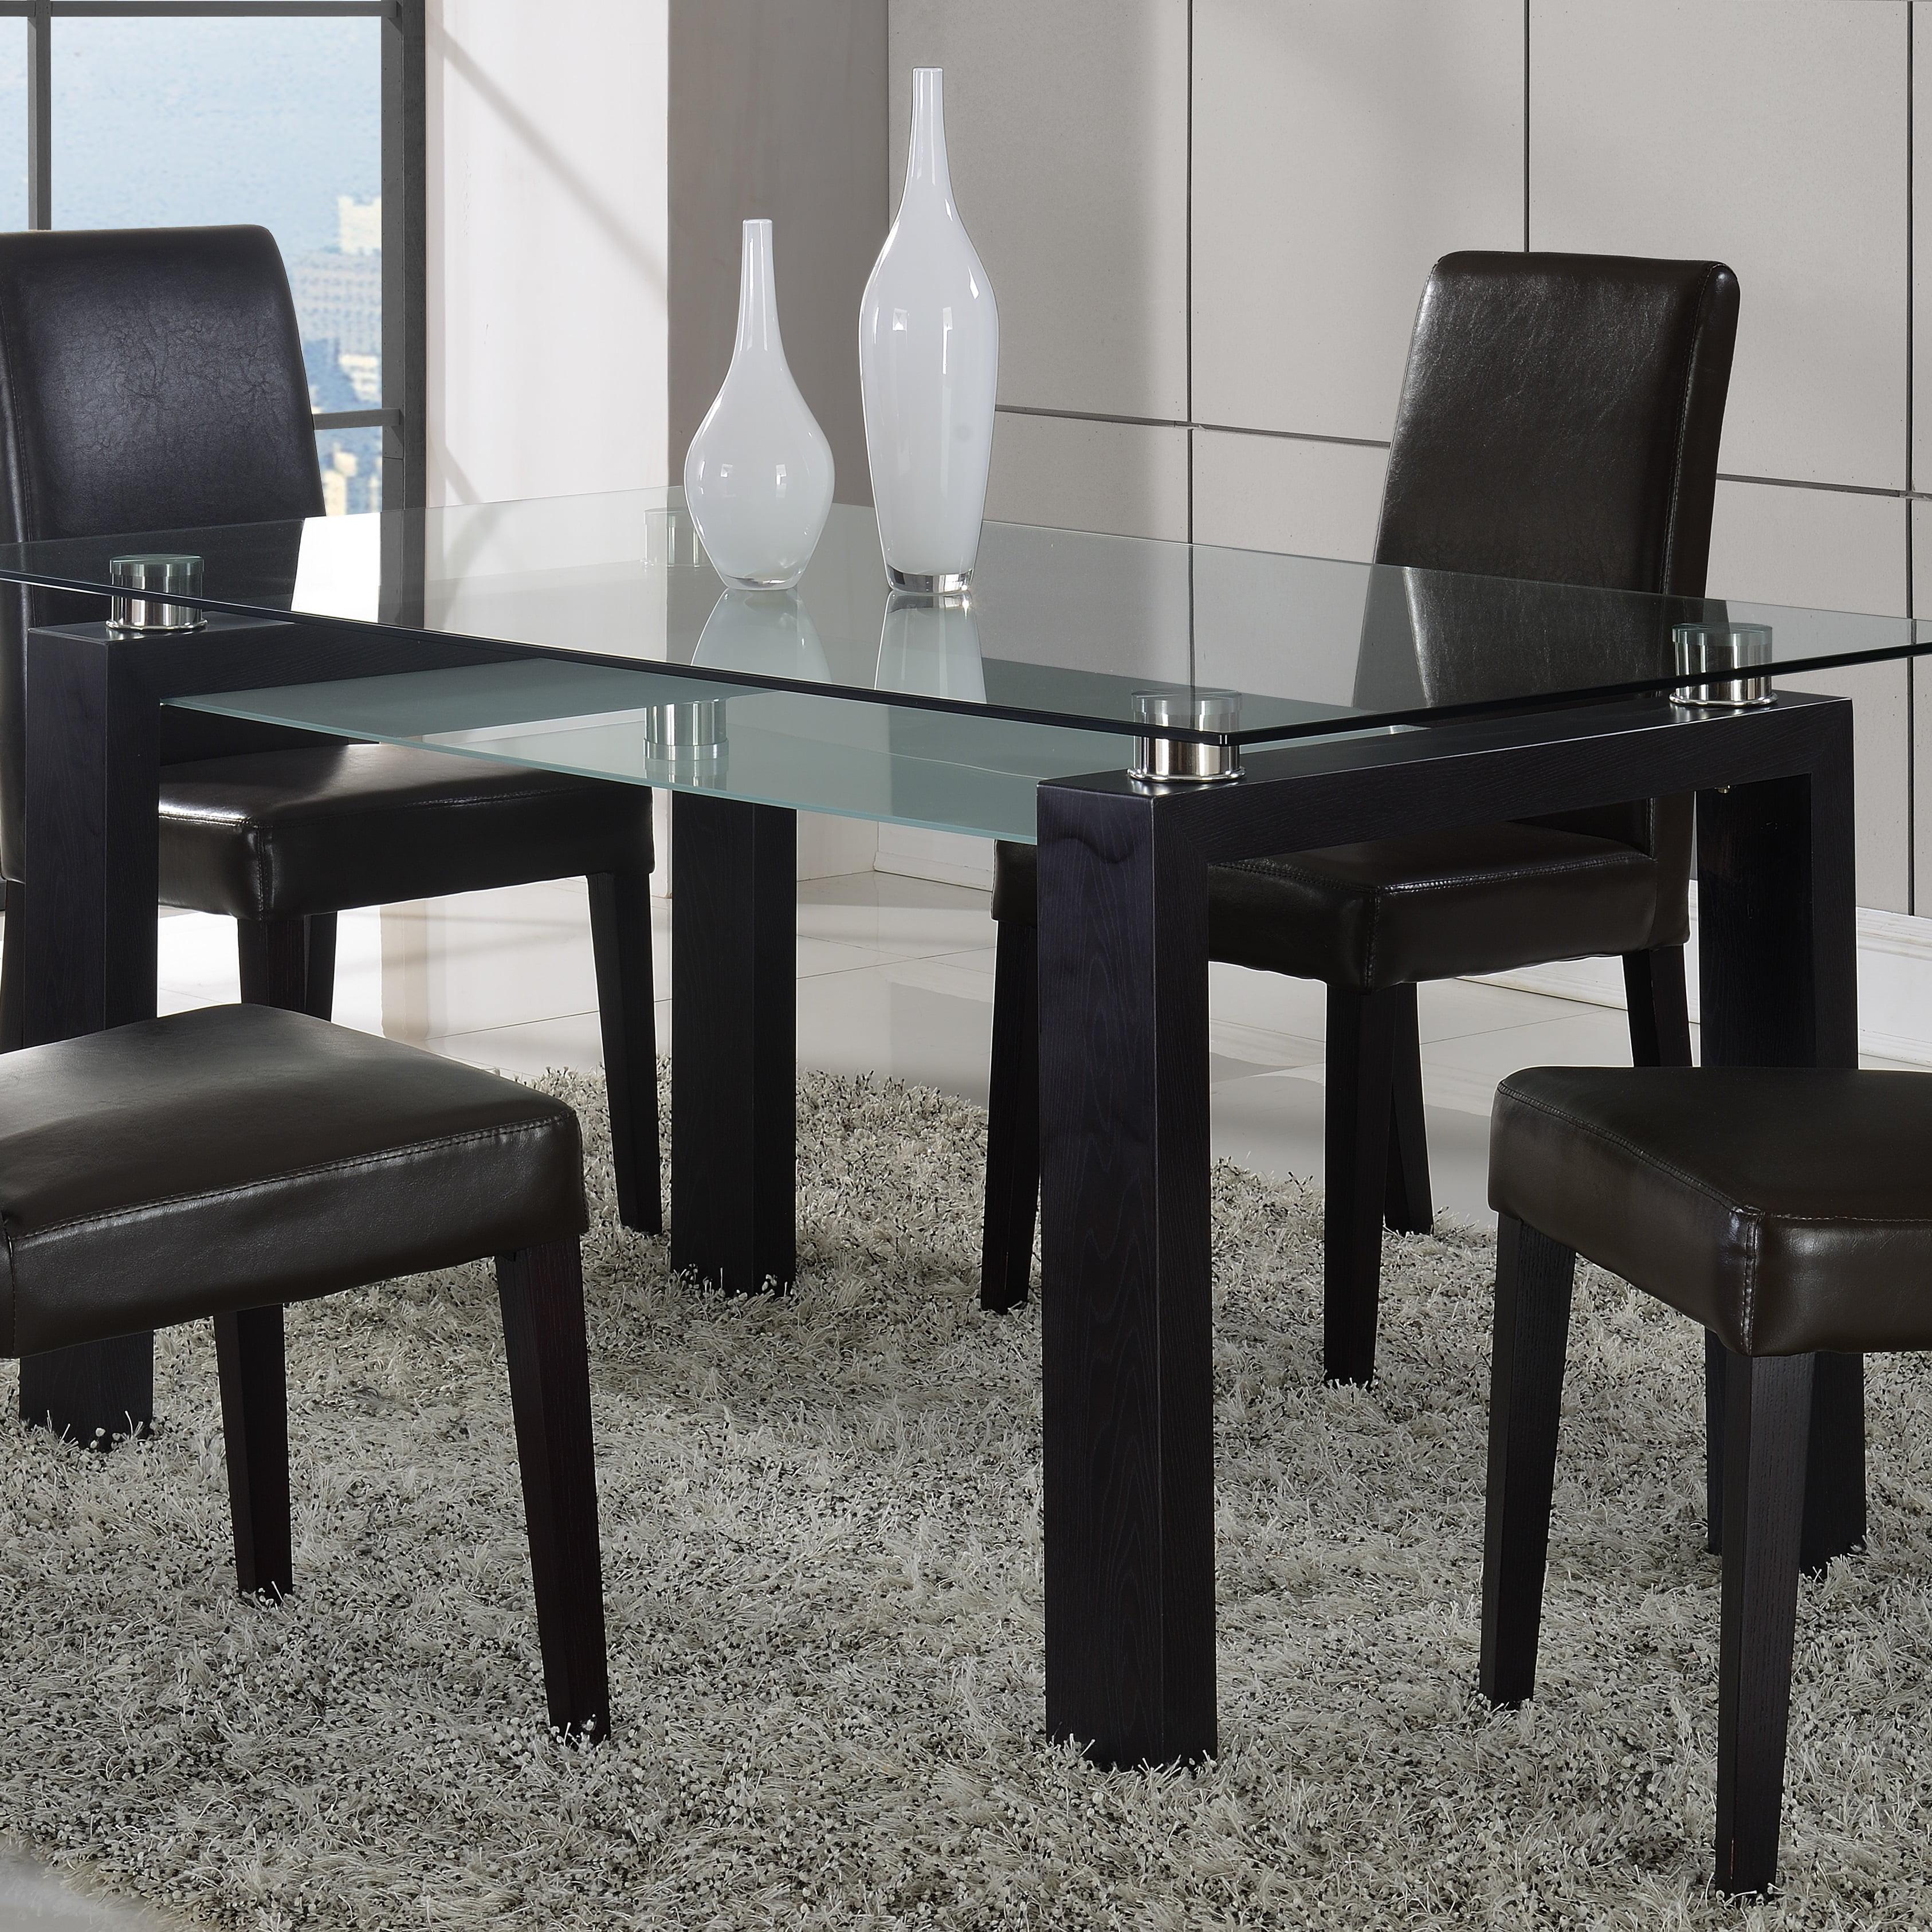 Global Furniture Usa Black Walnut Glass-top Dining Table - N/A